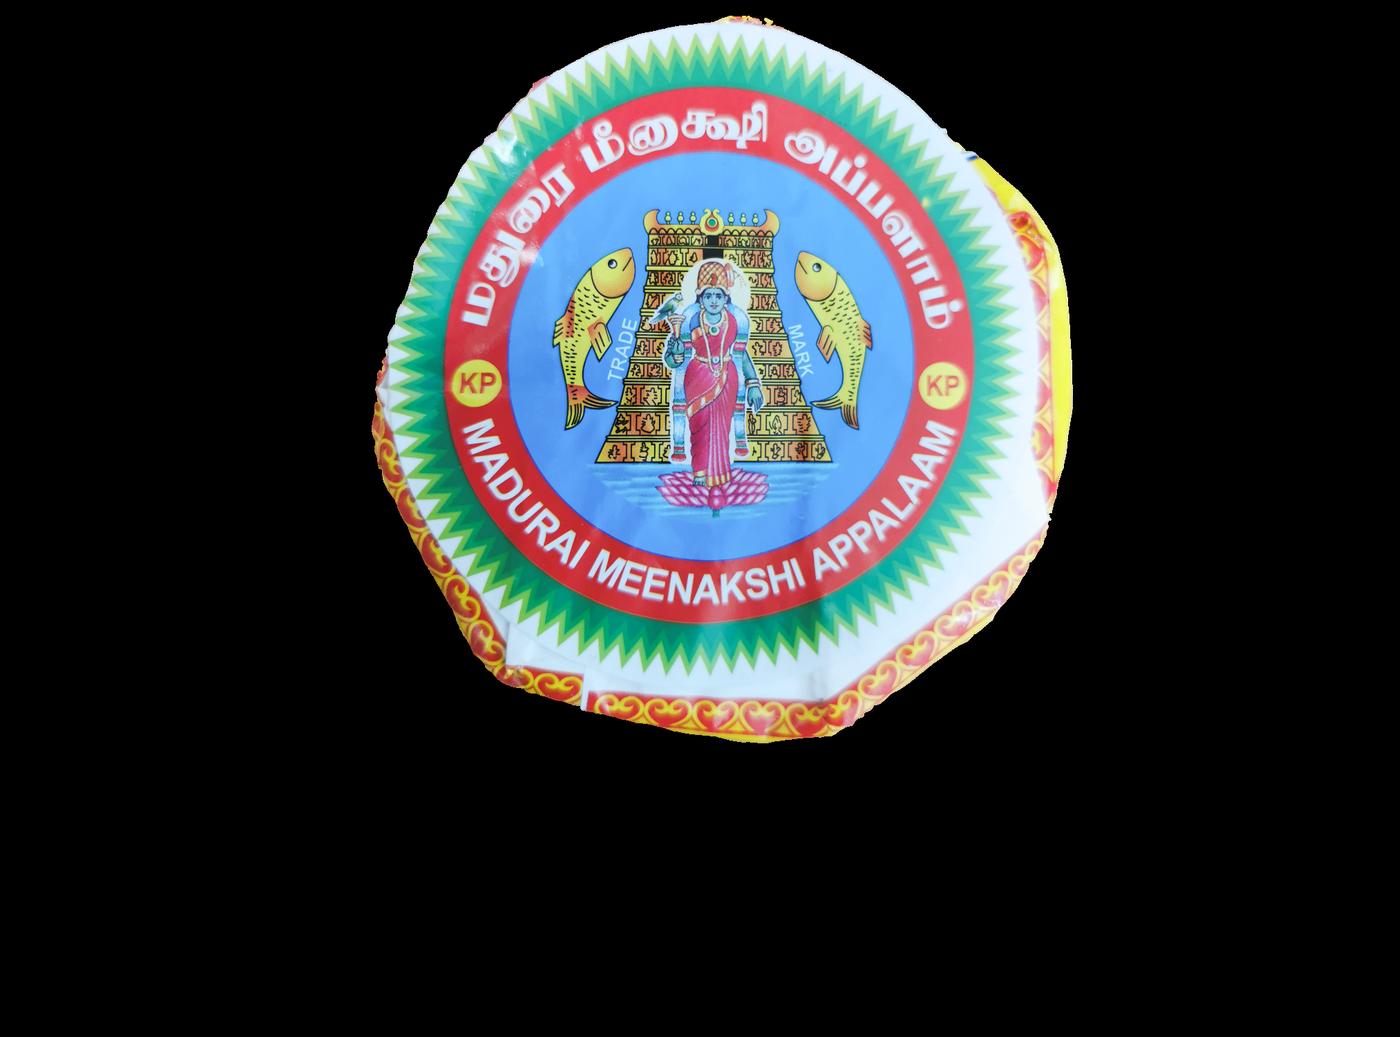 Madurai Meenakshi Appalaam (Pappadum)